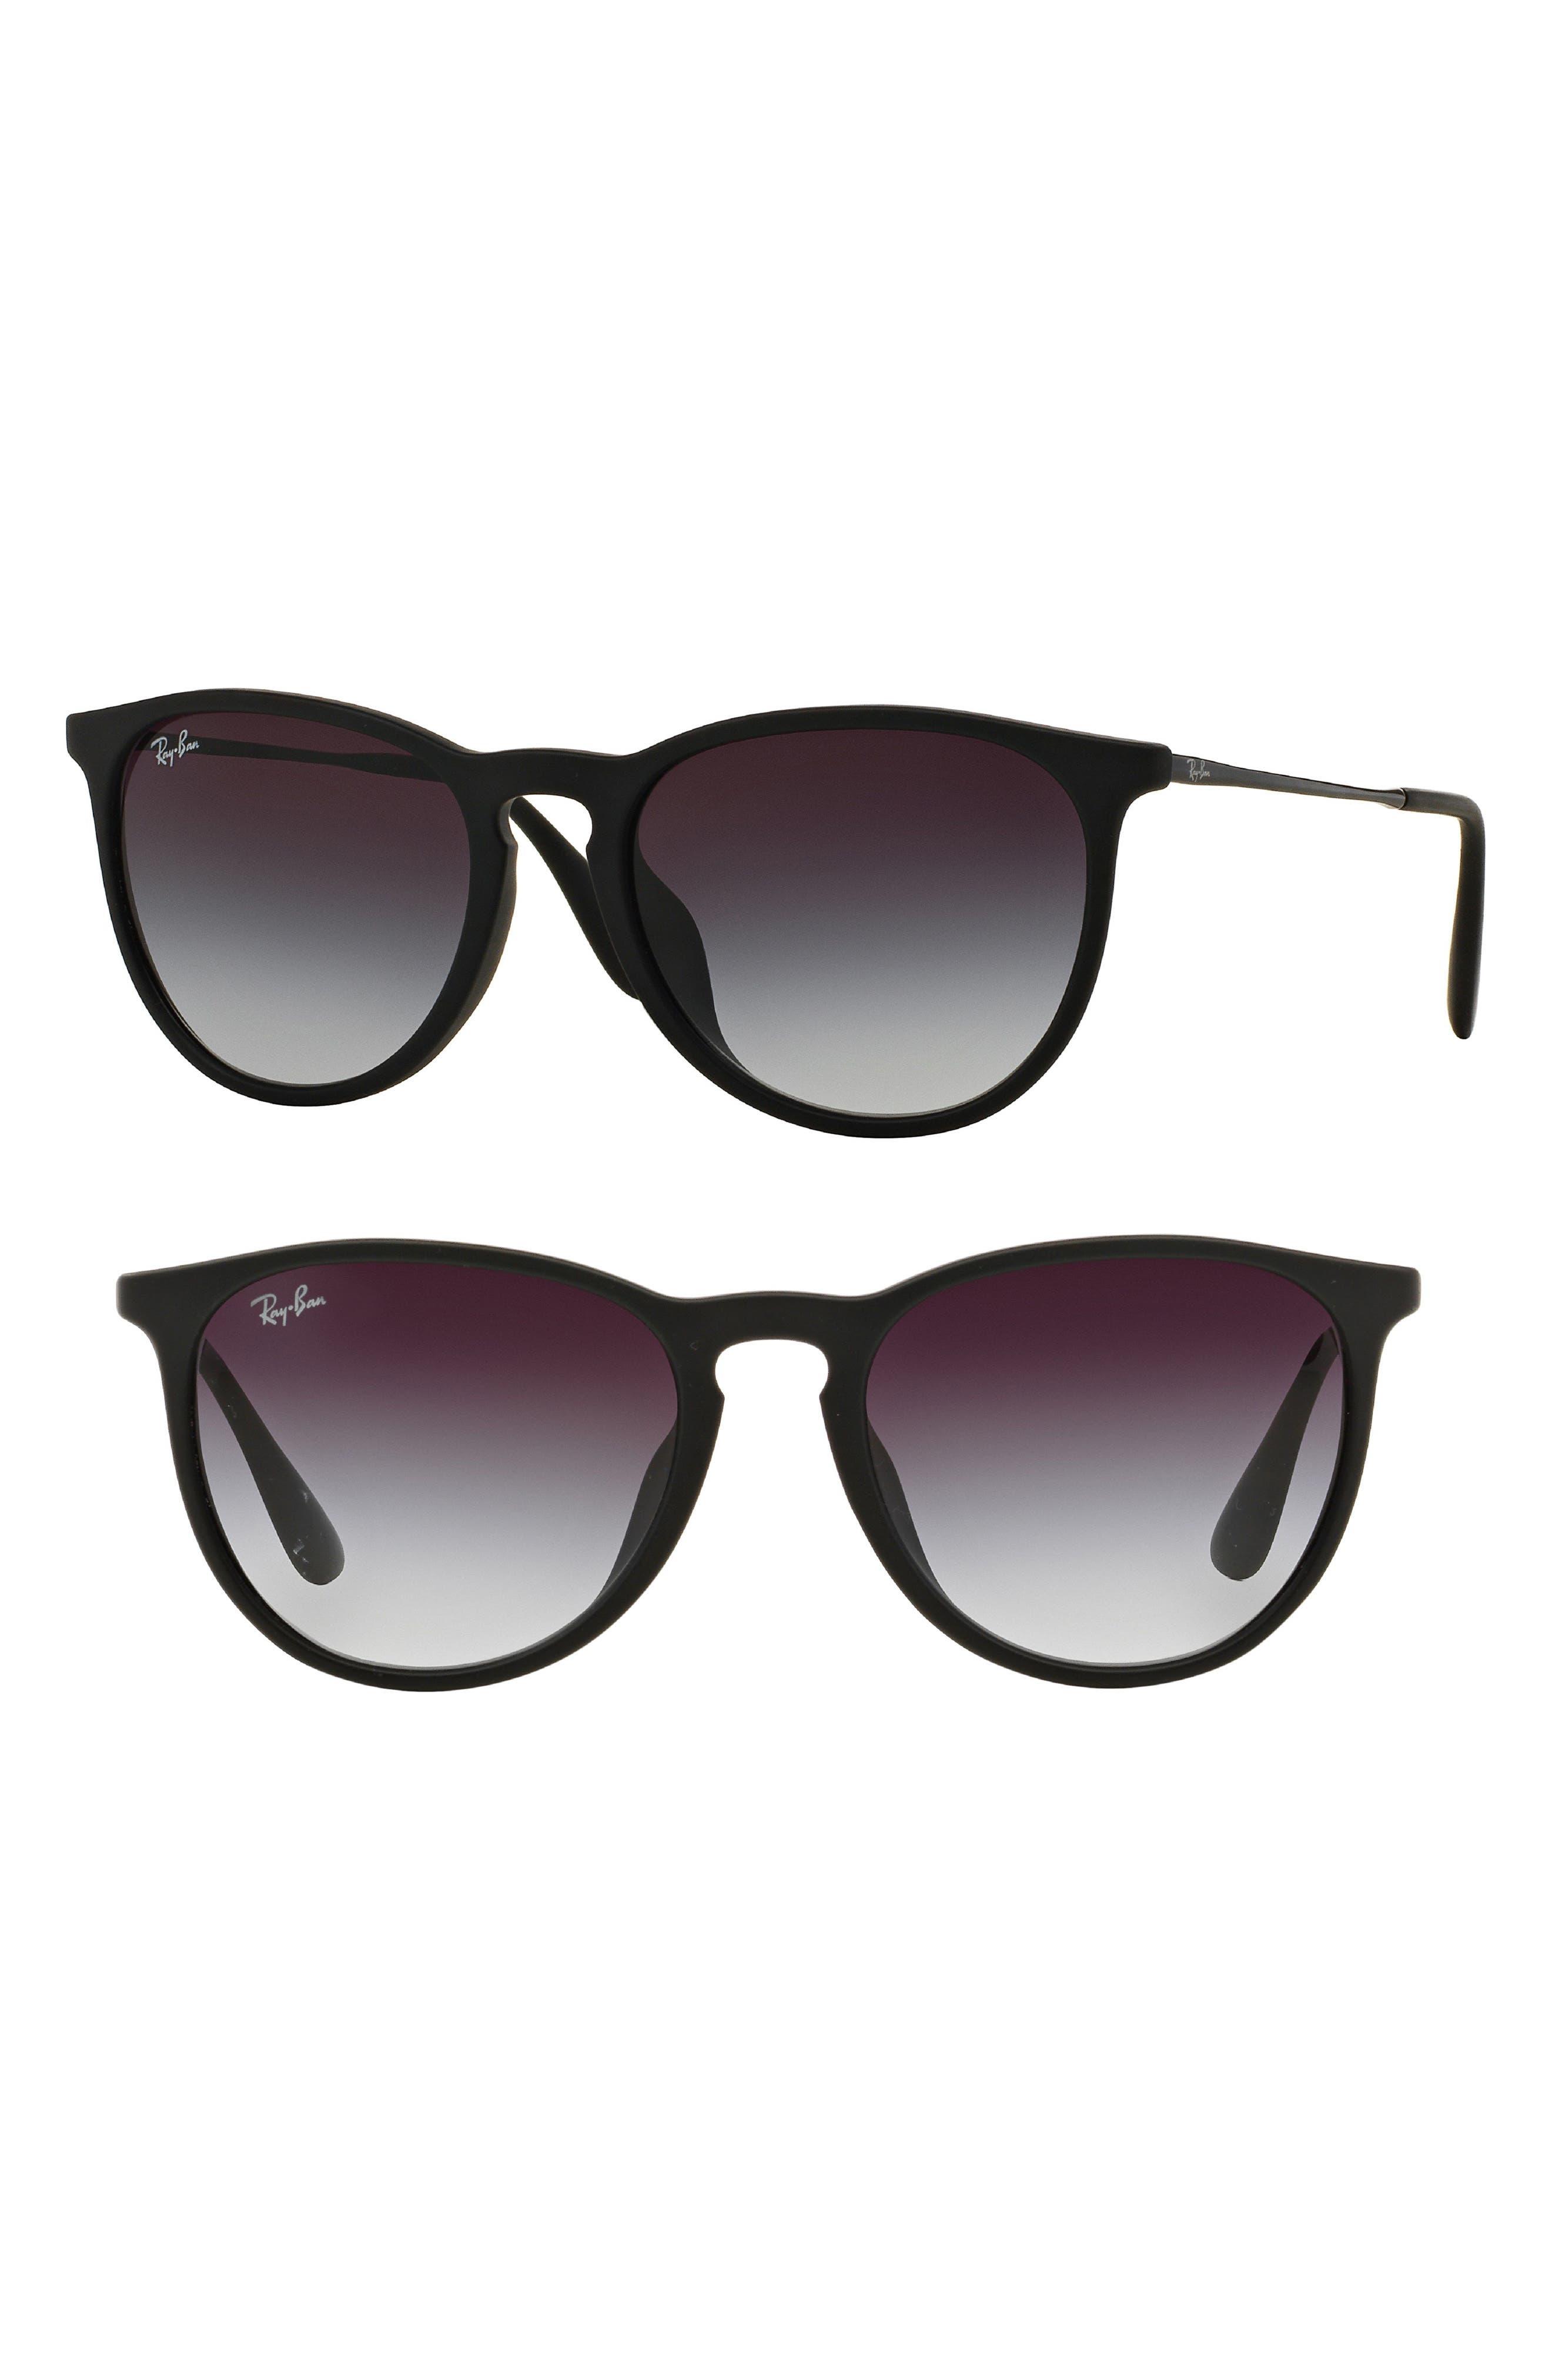 Erika Classic 57mm Sunglasses,                             Main thumbnail 1, color,                             001